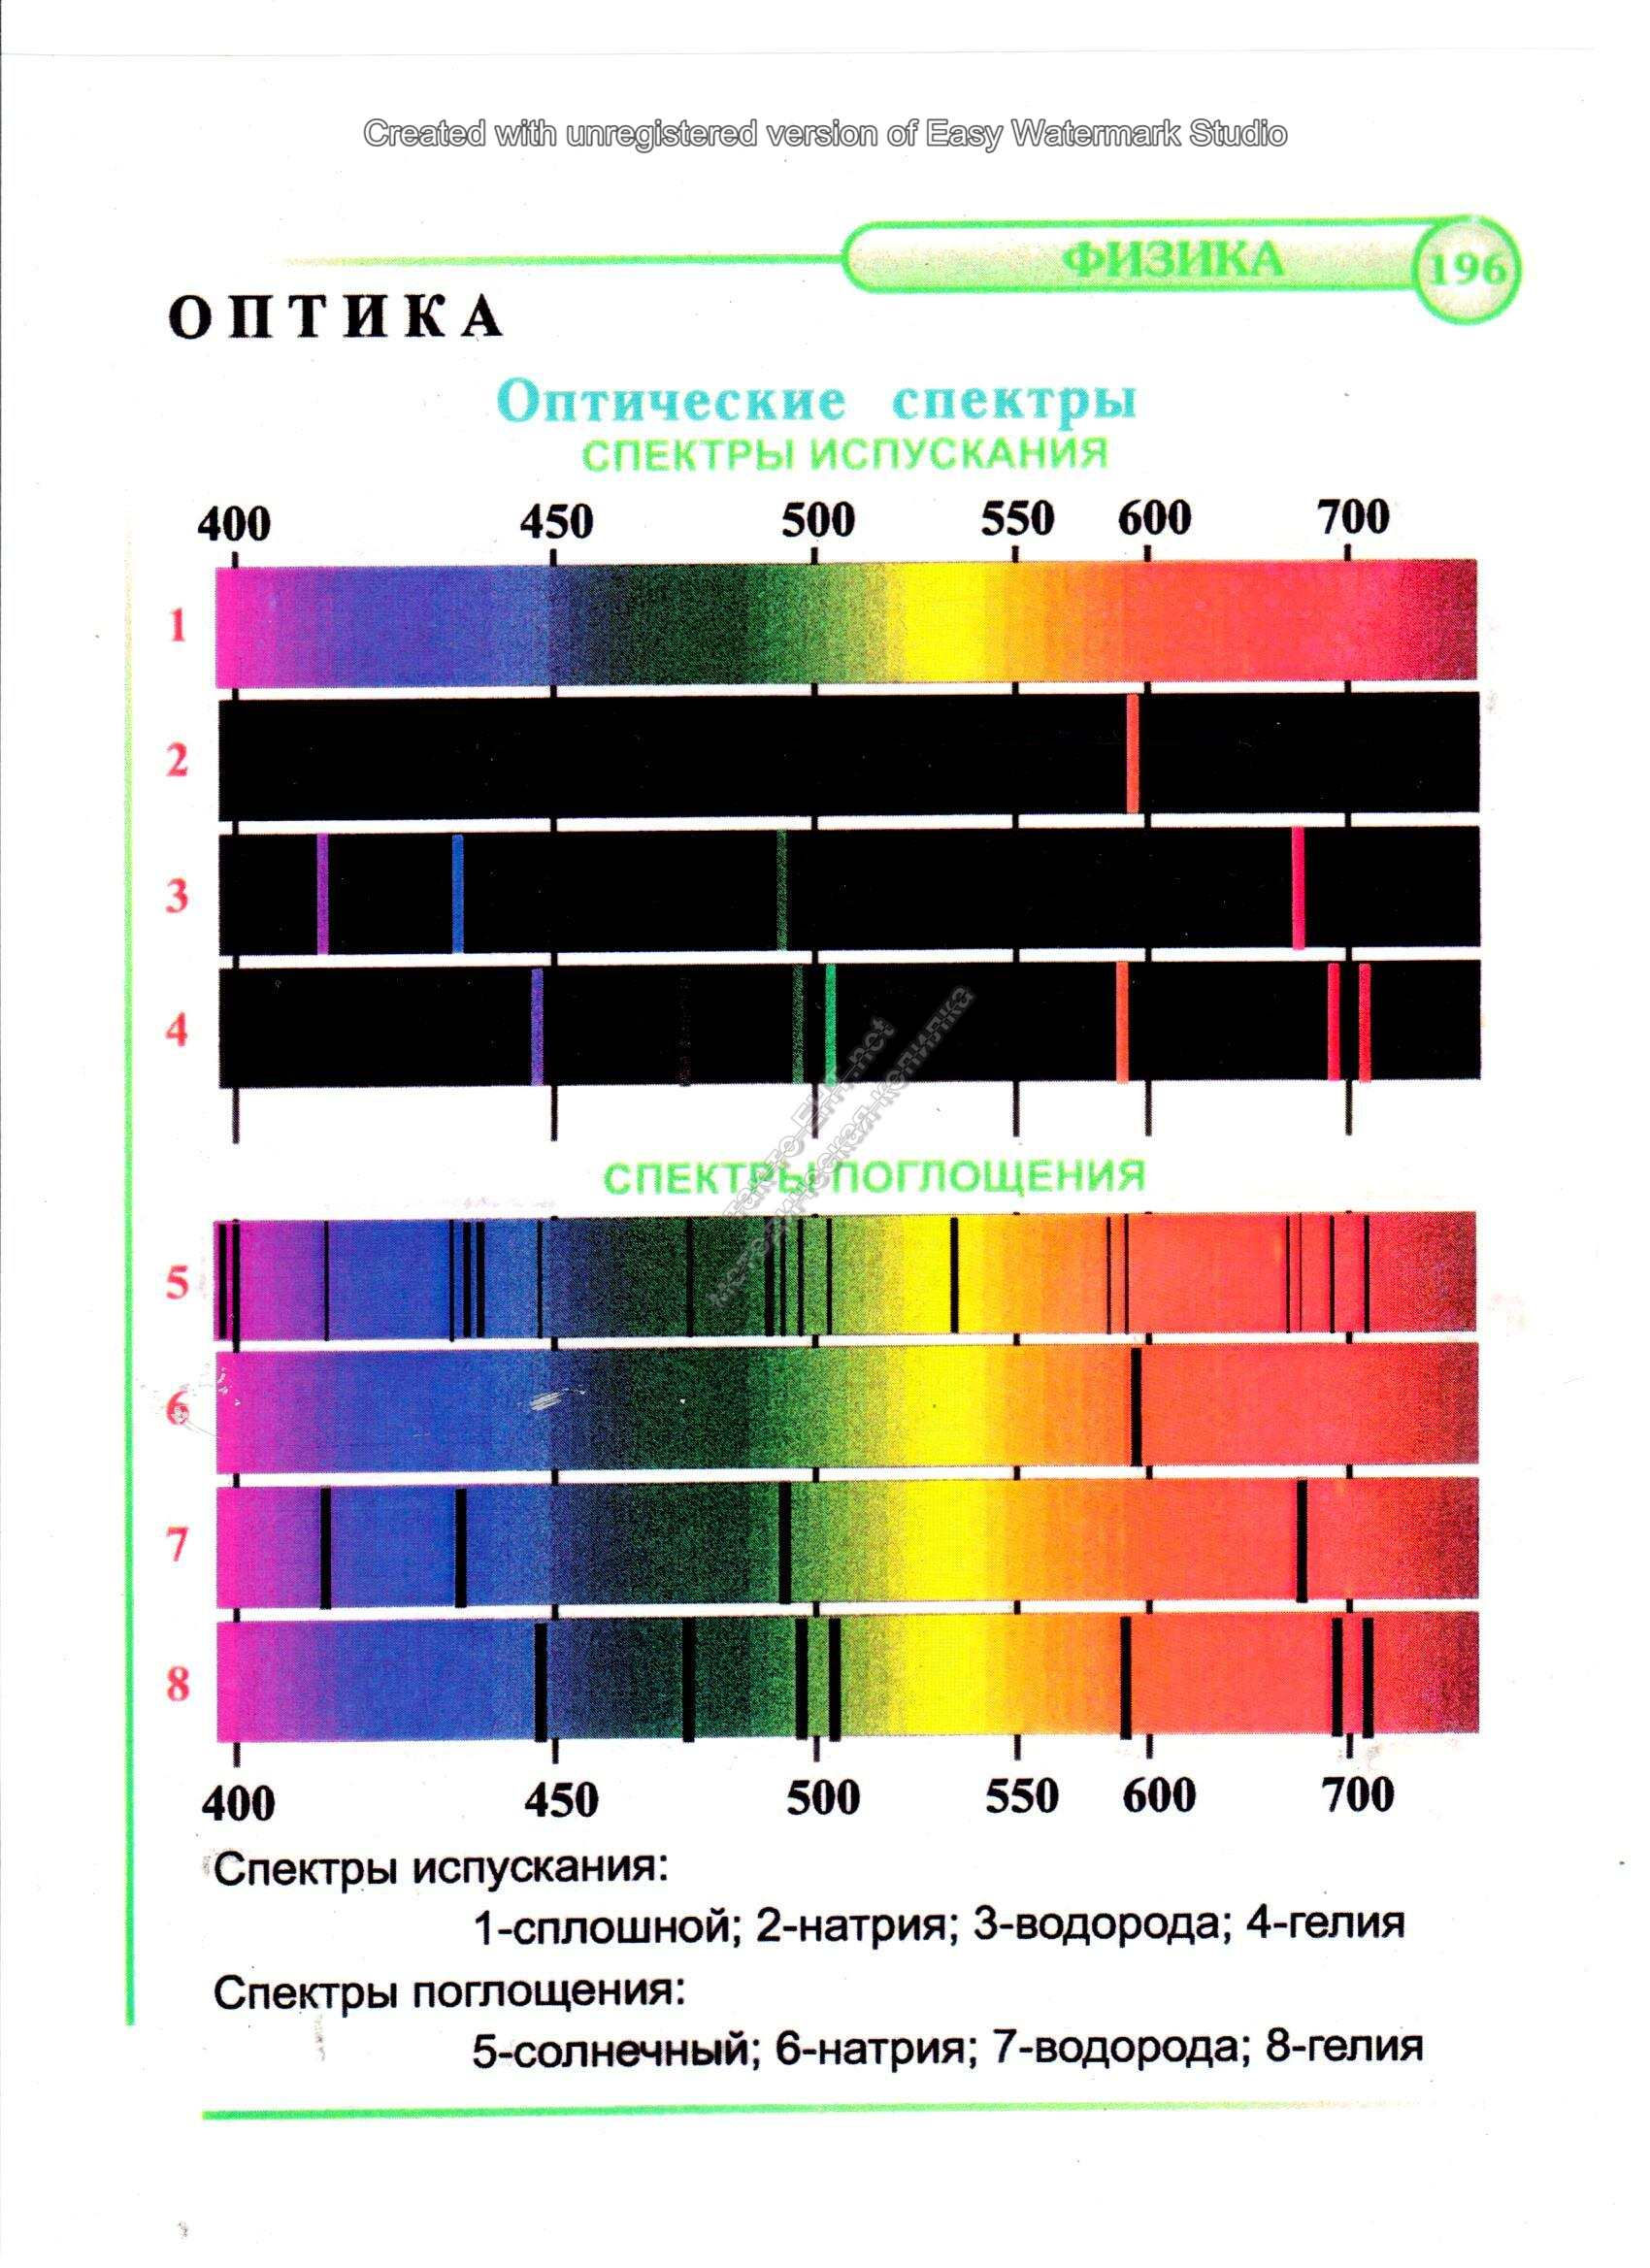 Оптические спектры. Спектры испускания